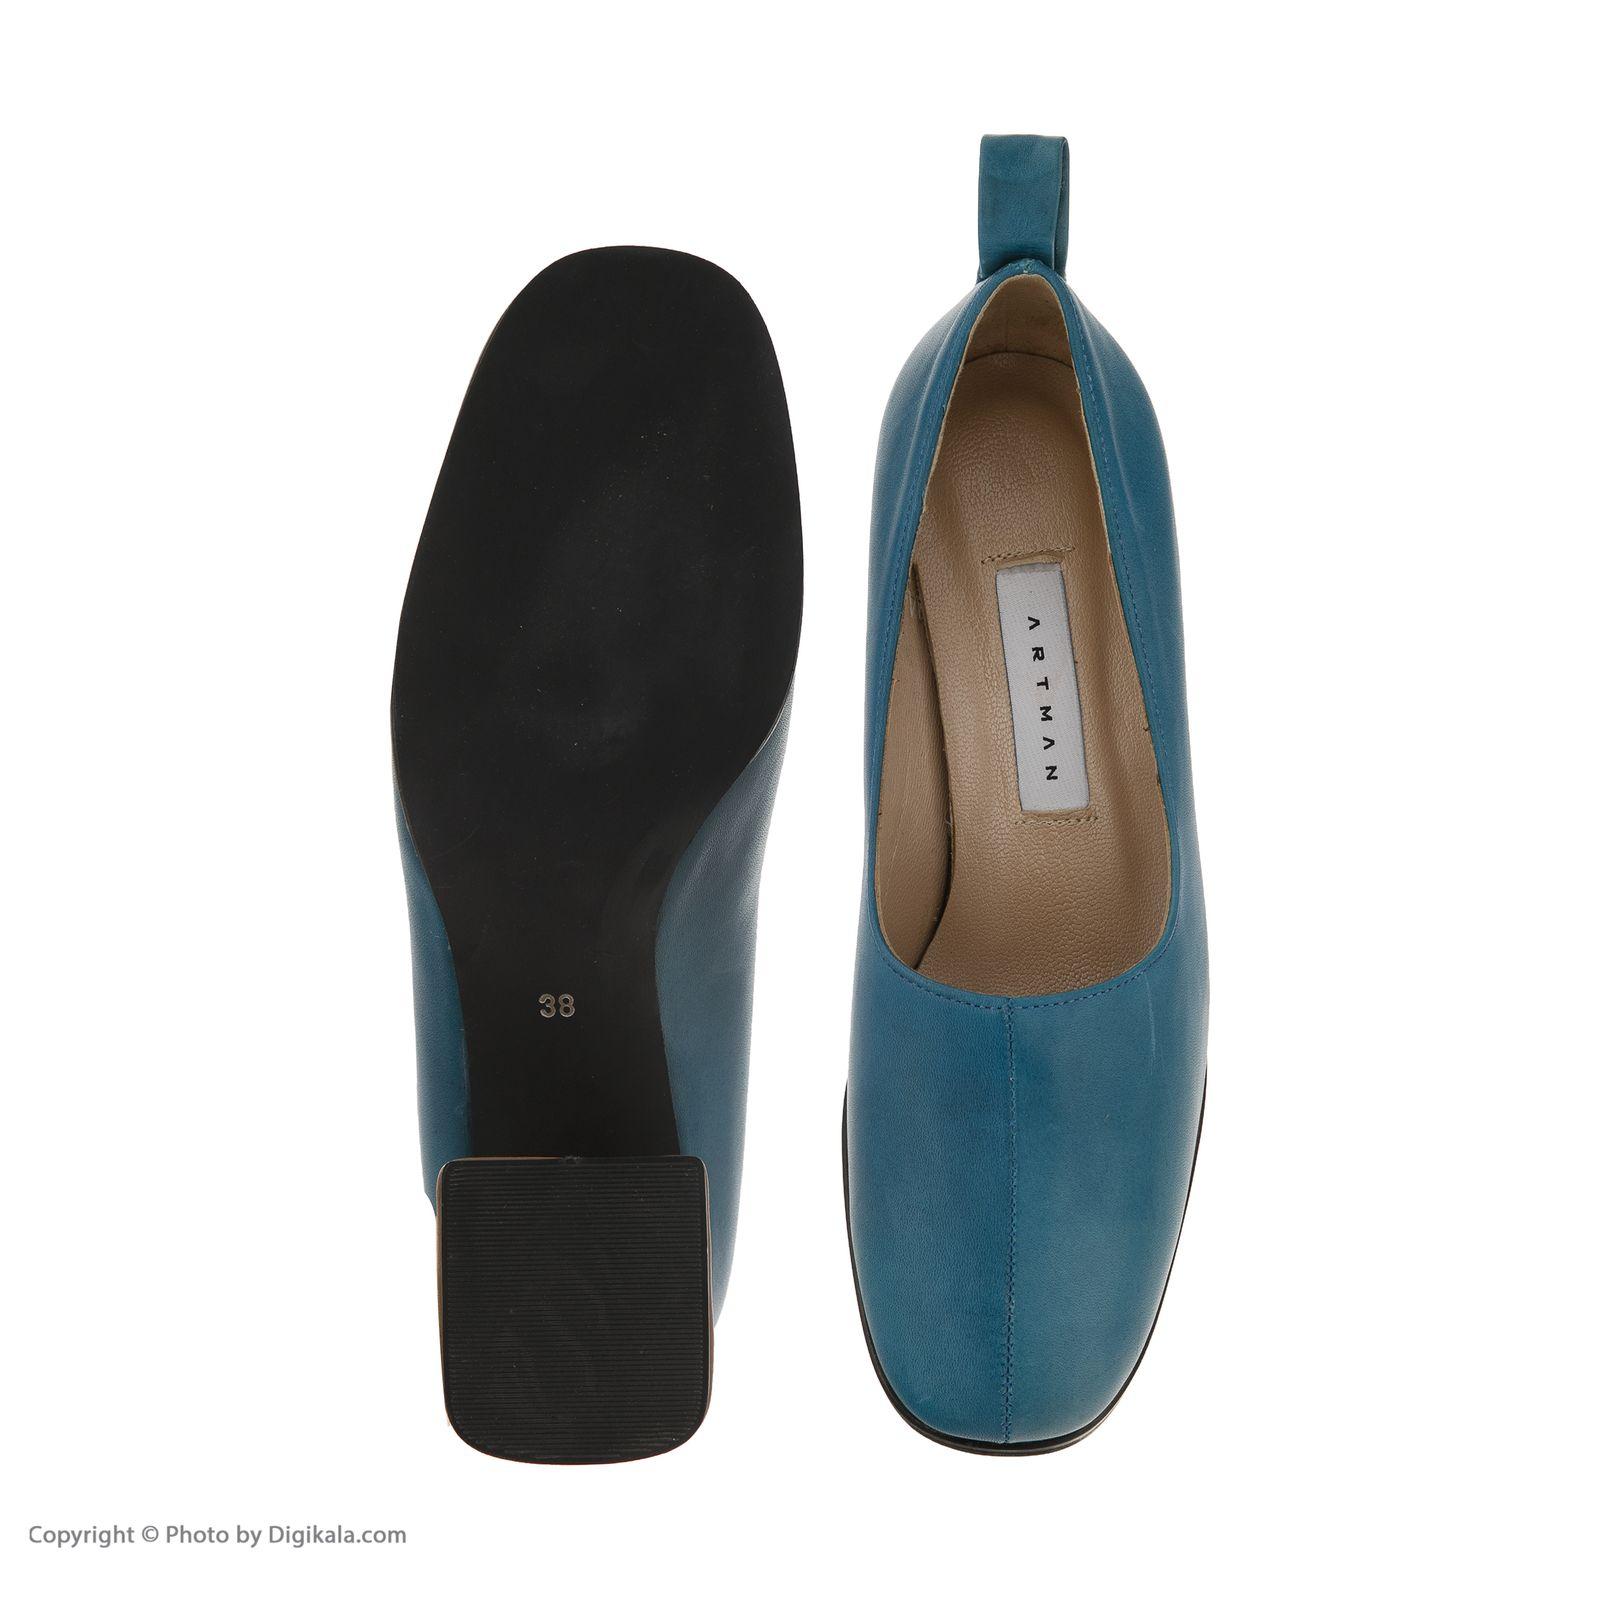 کفش زنانه آرتمن مدل leroy-42694-158 -  - 7